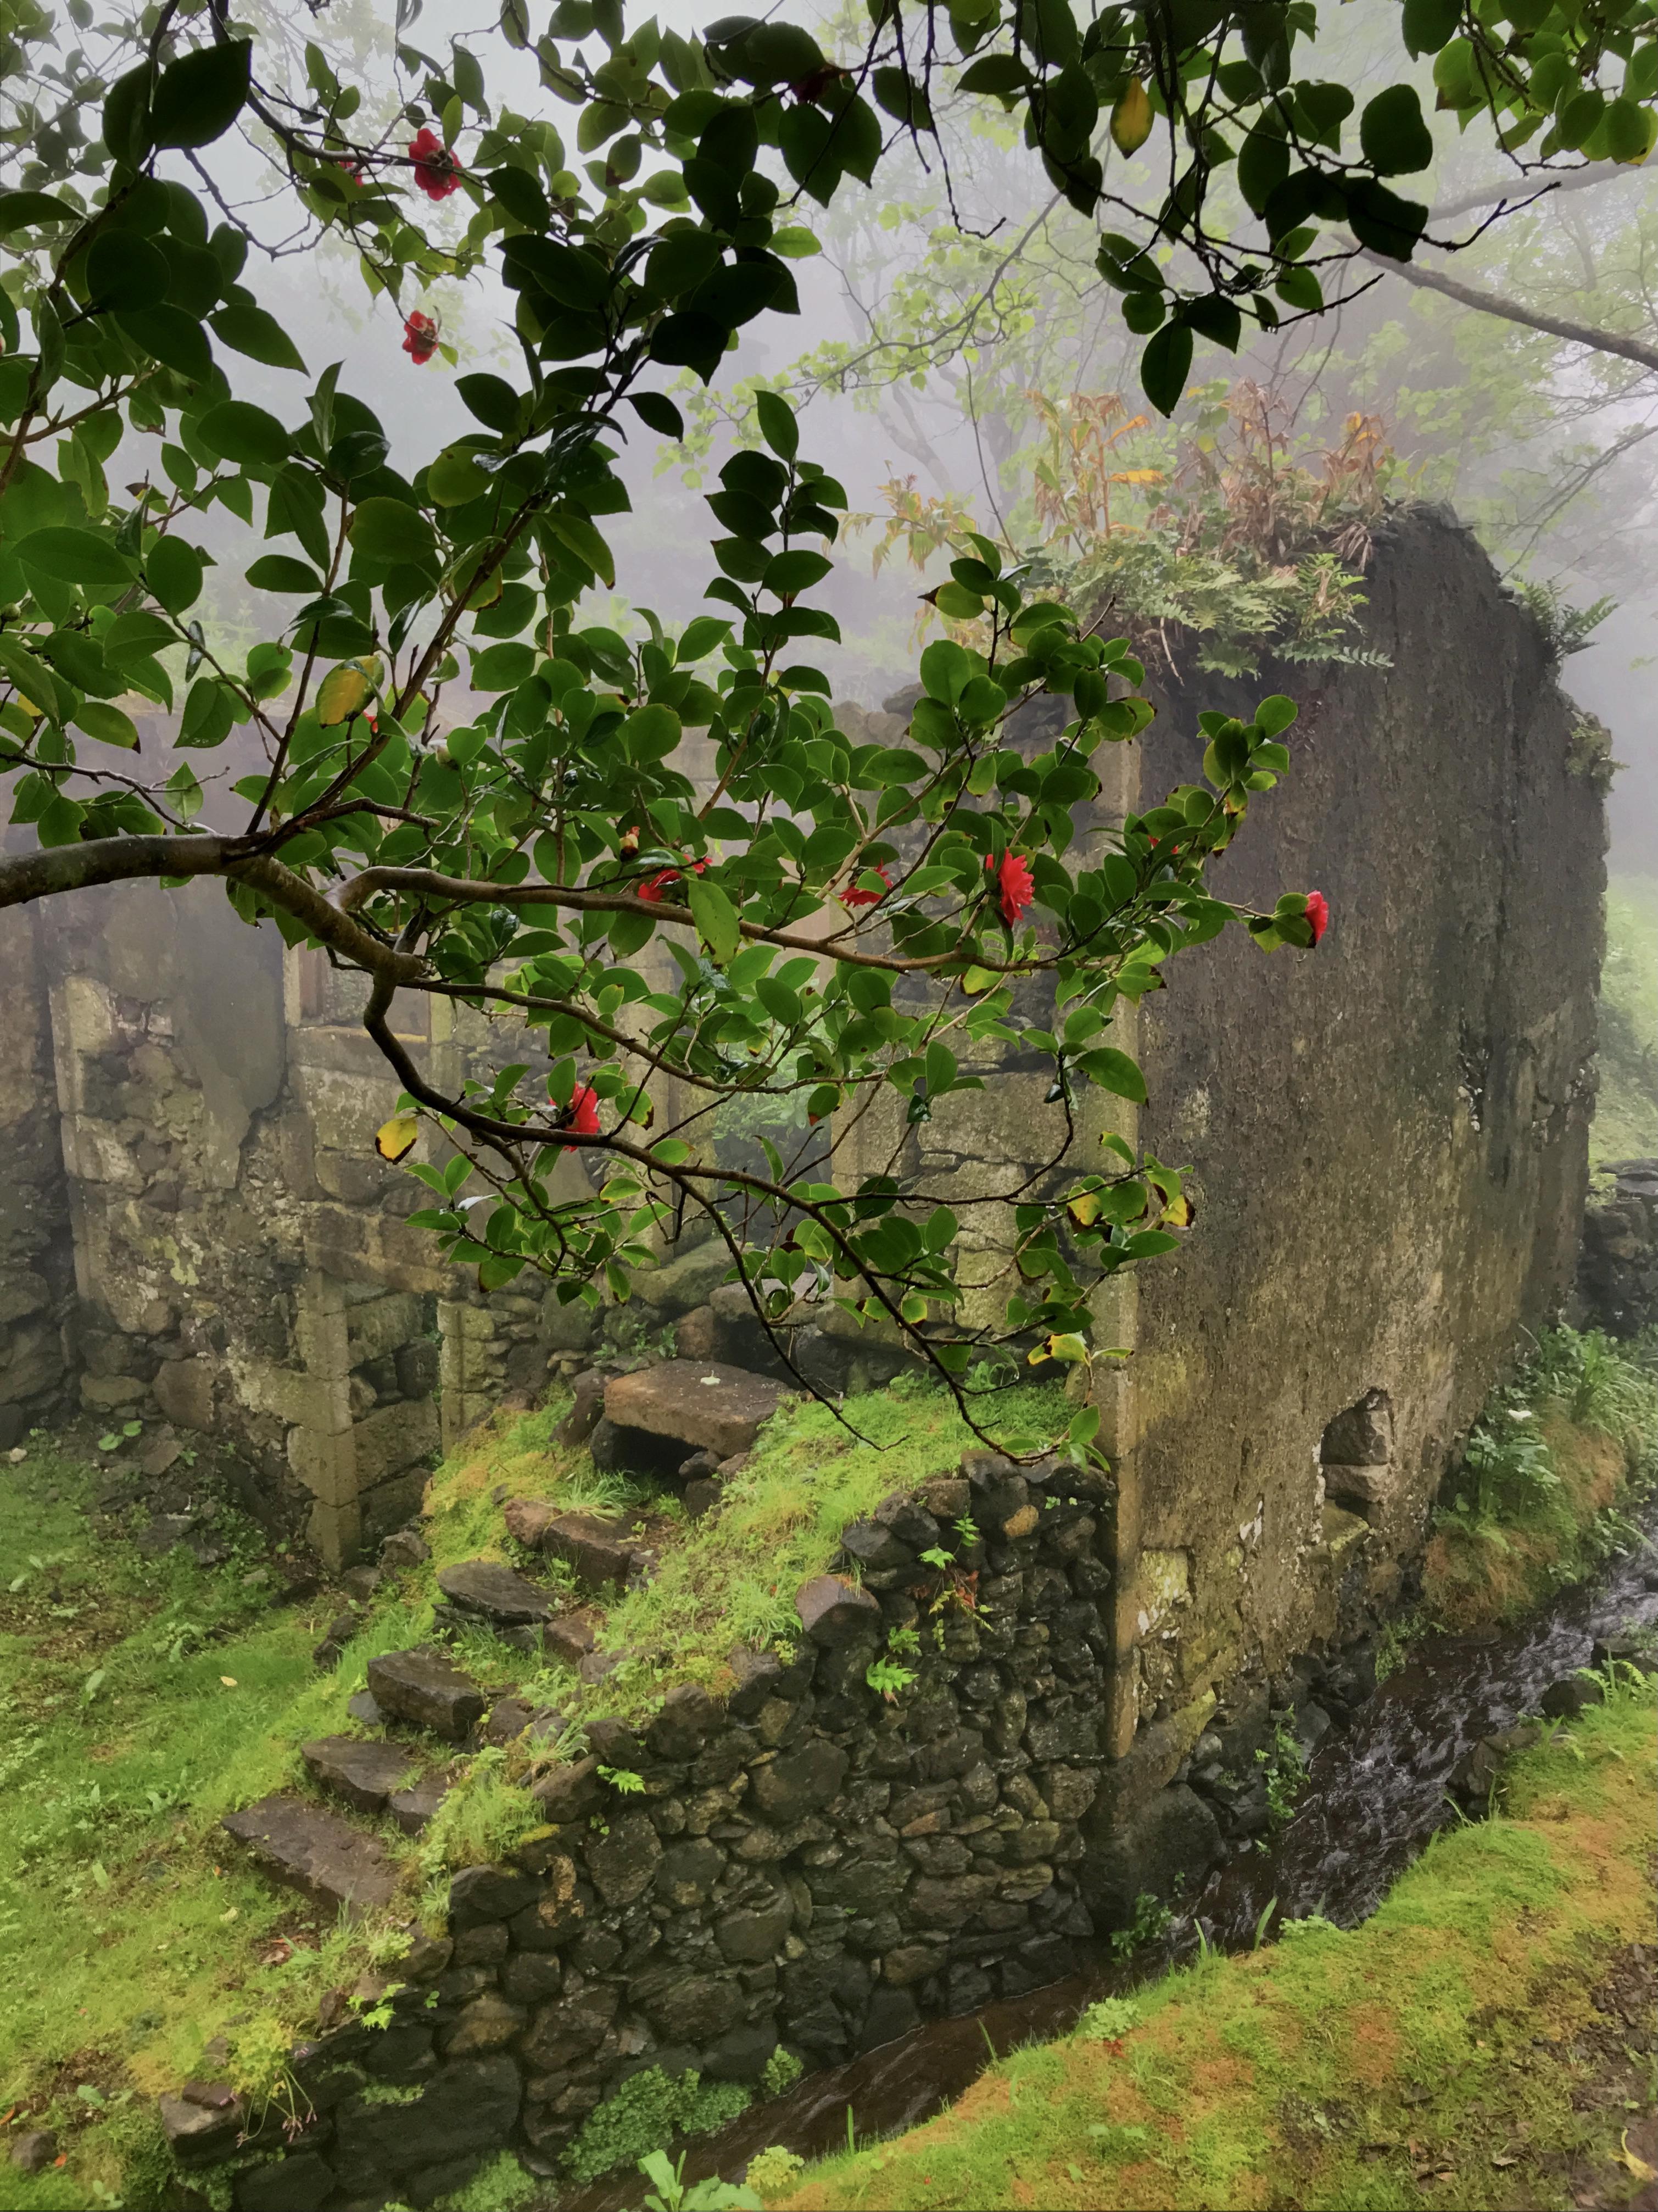 Casa do Verde through camellia